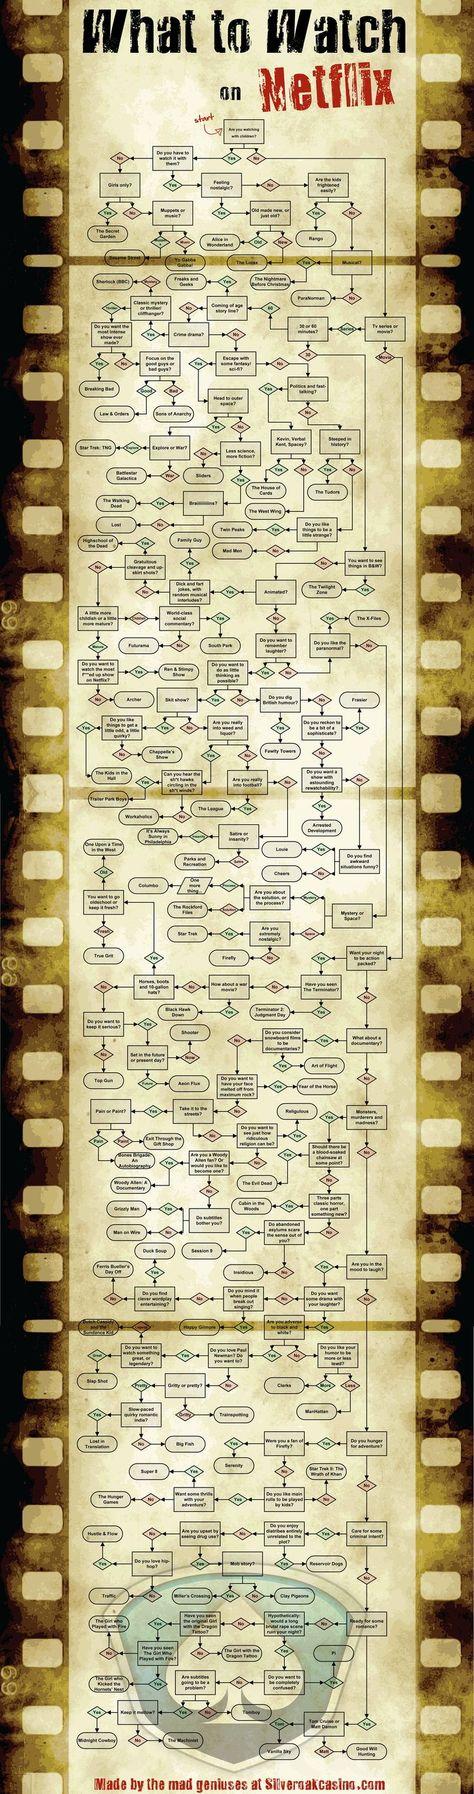 This Genius Netflix Flowchart Will Tell You Exactly What to Watch - #flow #Flowchart #Genius #Netflix #Watch